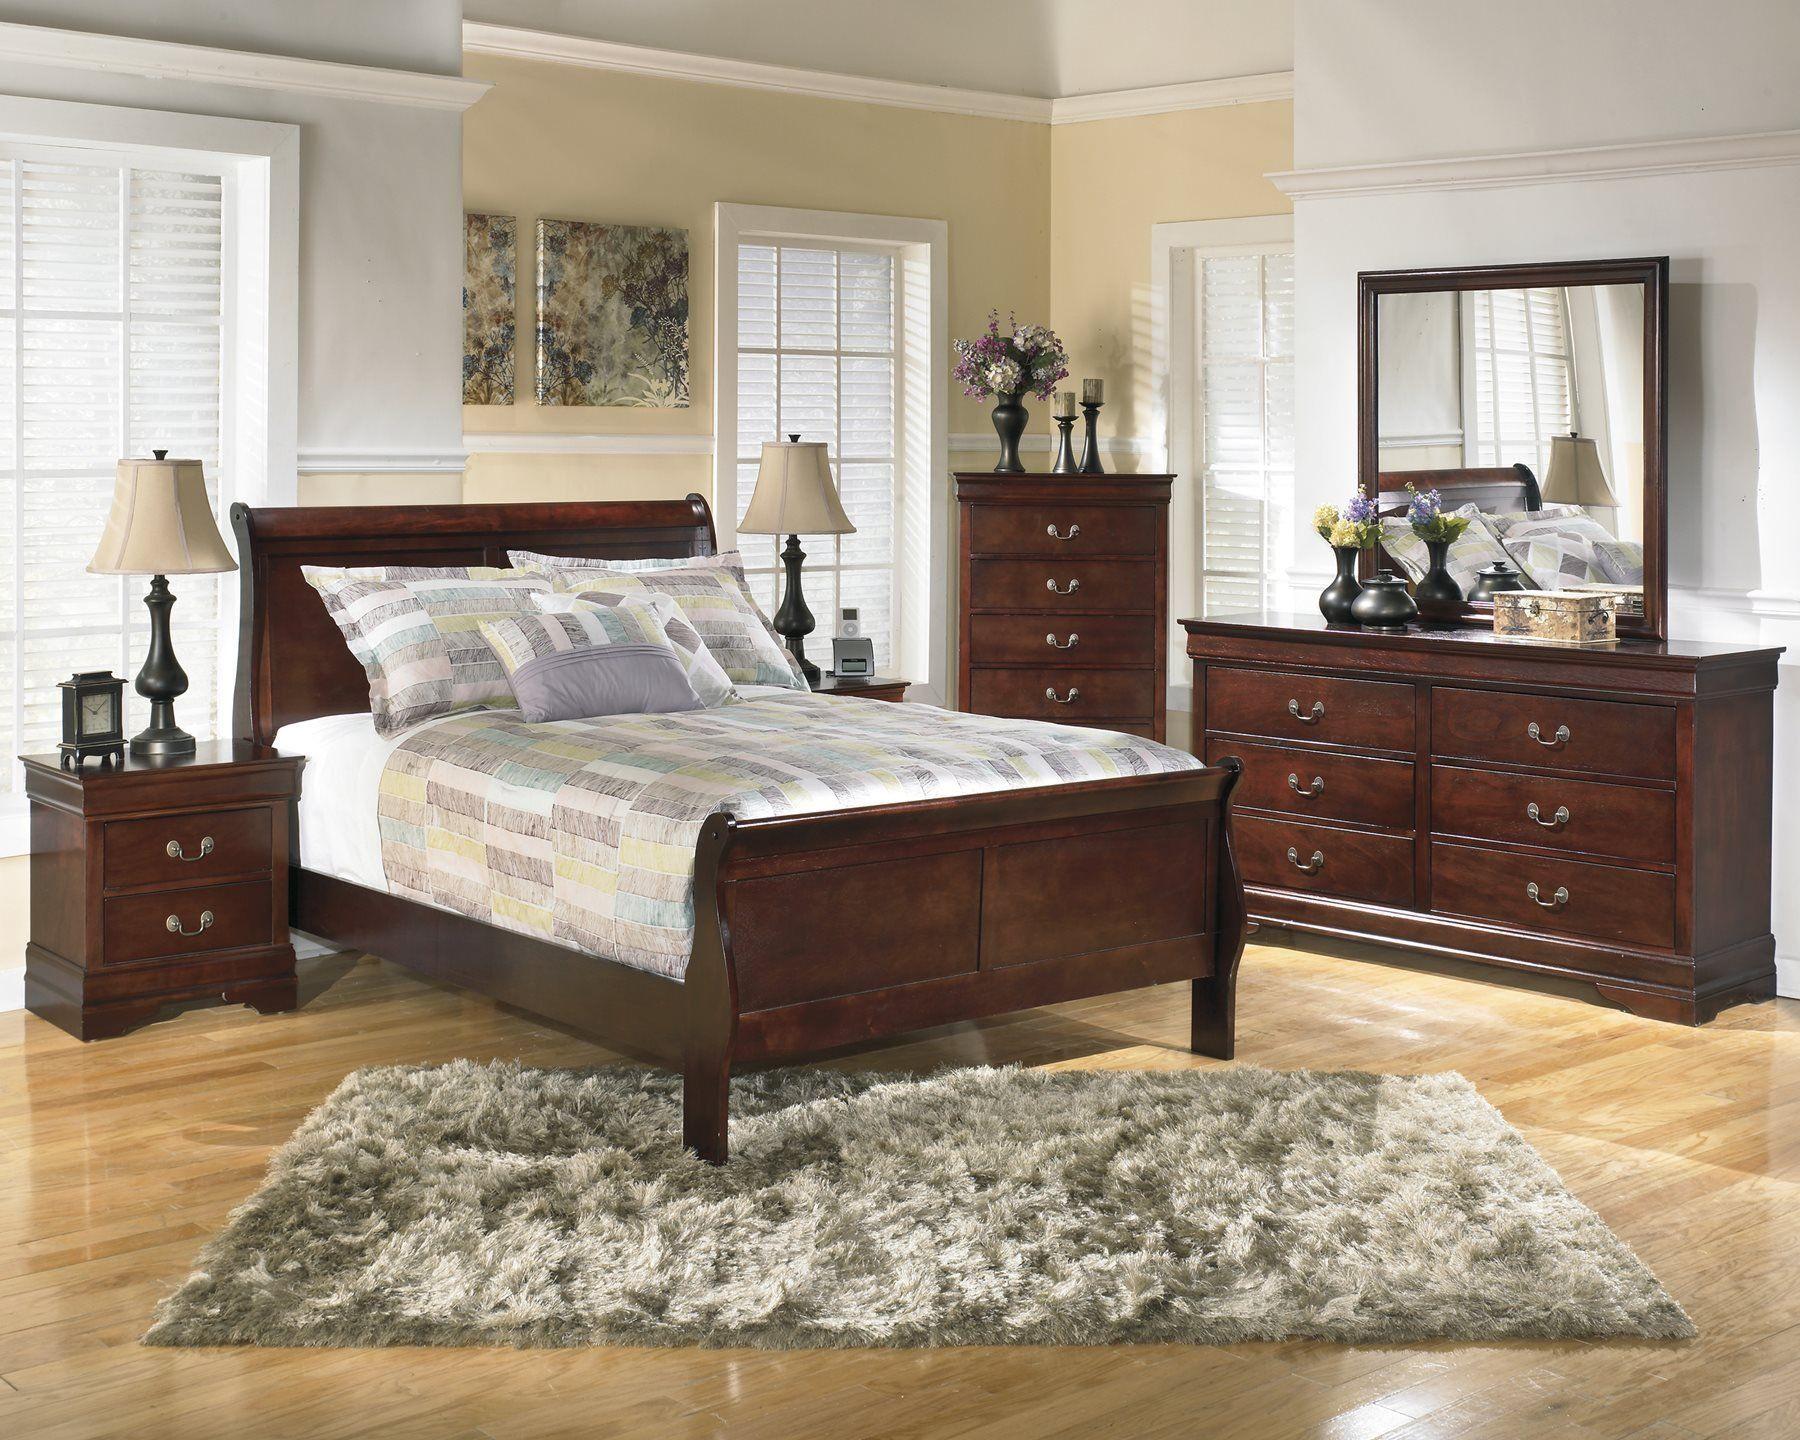 Ashley Alisdair 4pc Bedroom Set Cal King Sleigh Bed One Nightstand